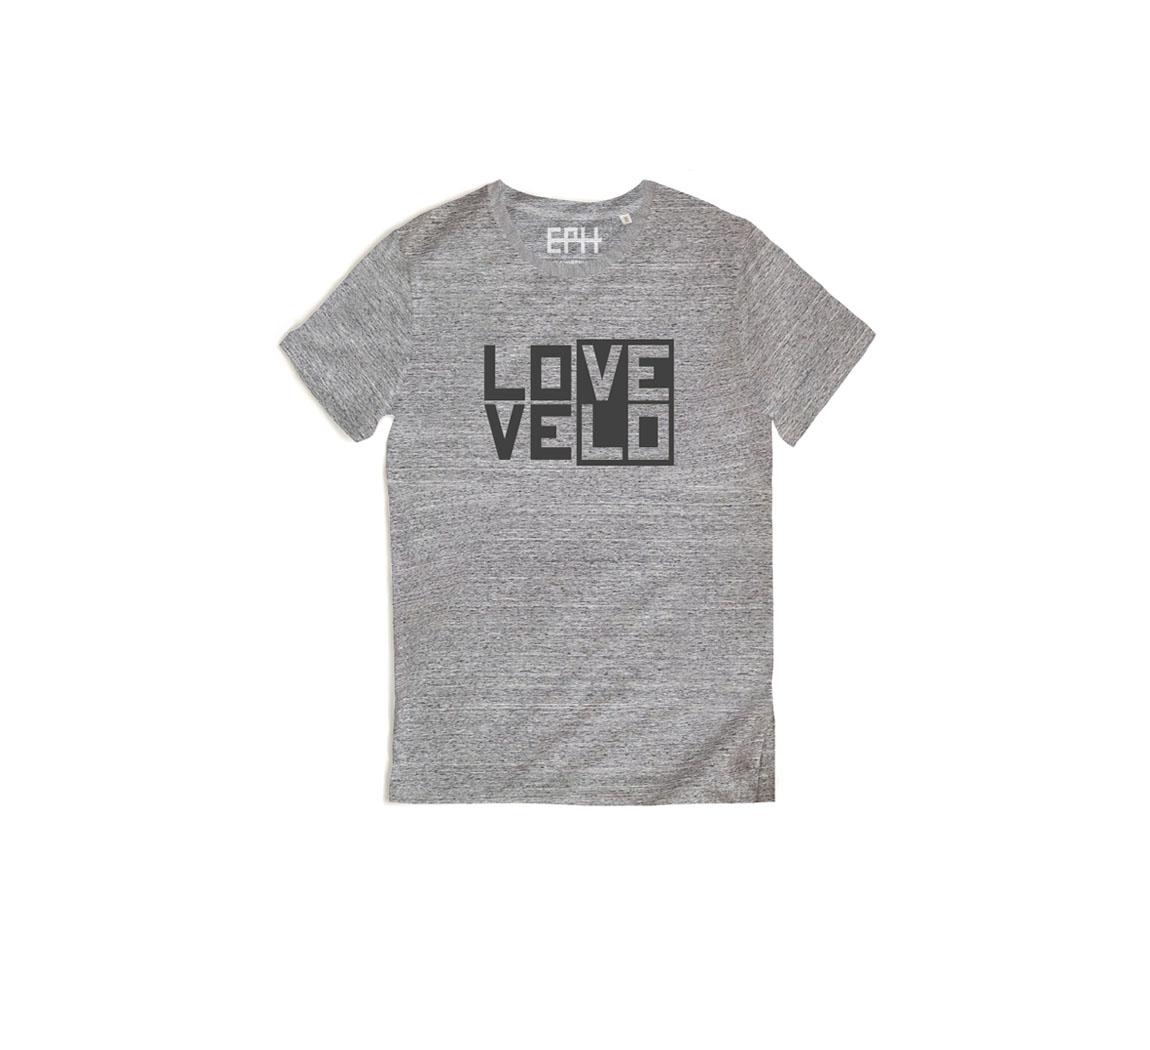 t shirt en coton bio en promo T-shirt EPH en Promo